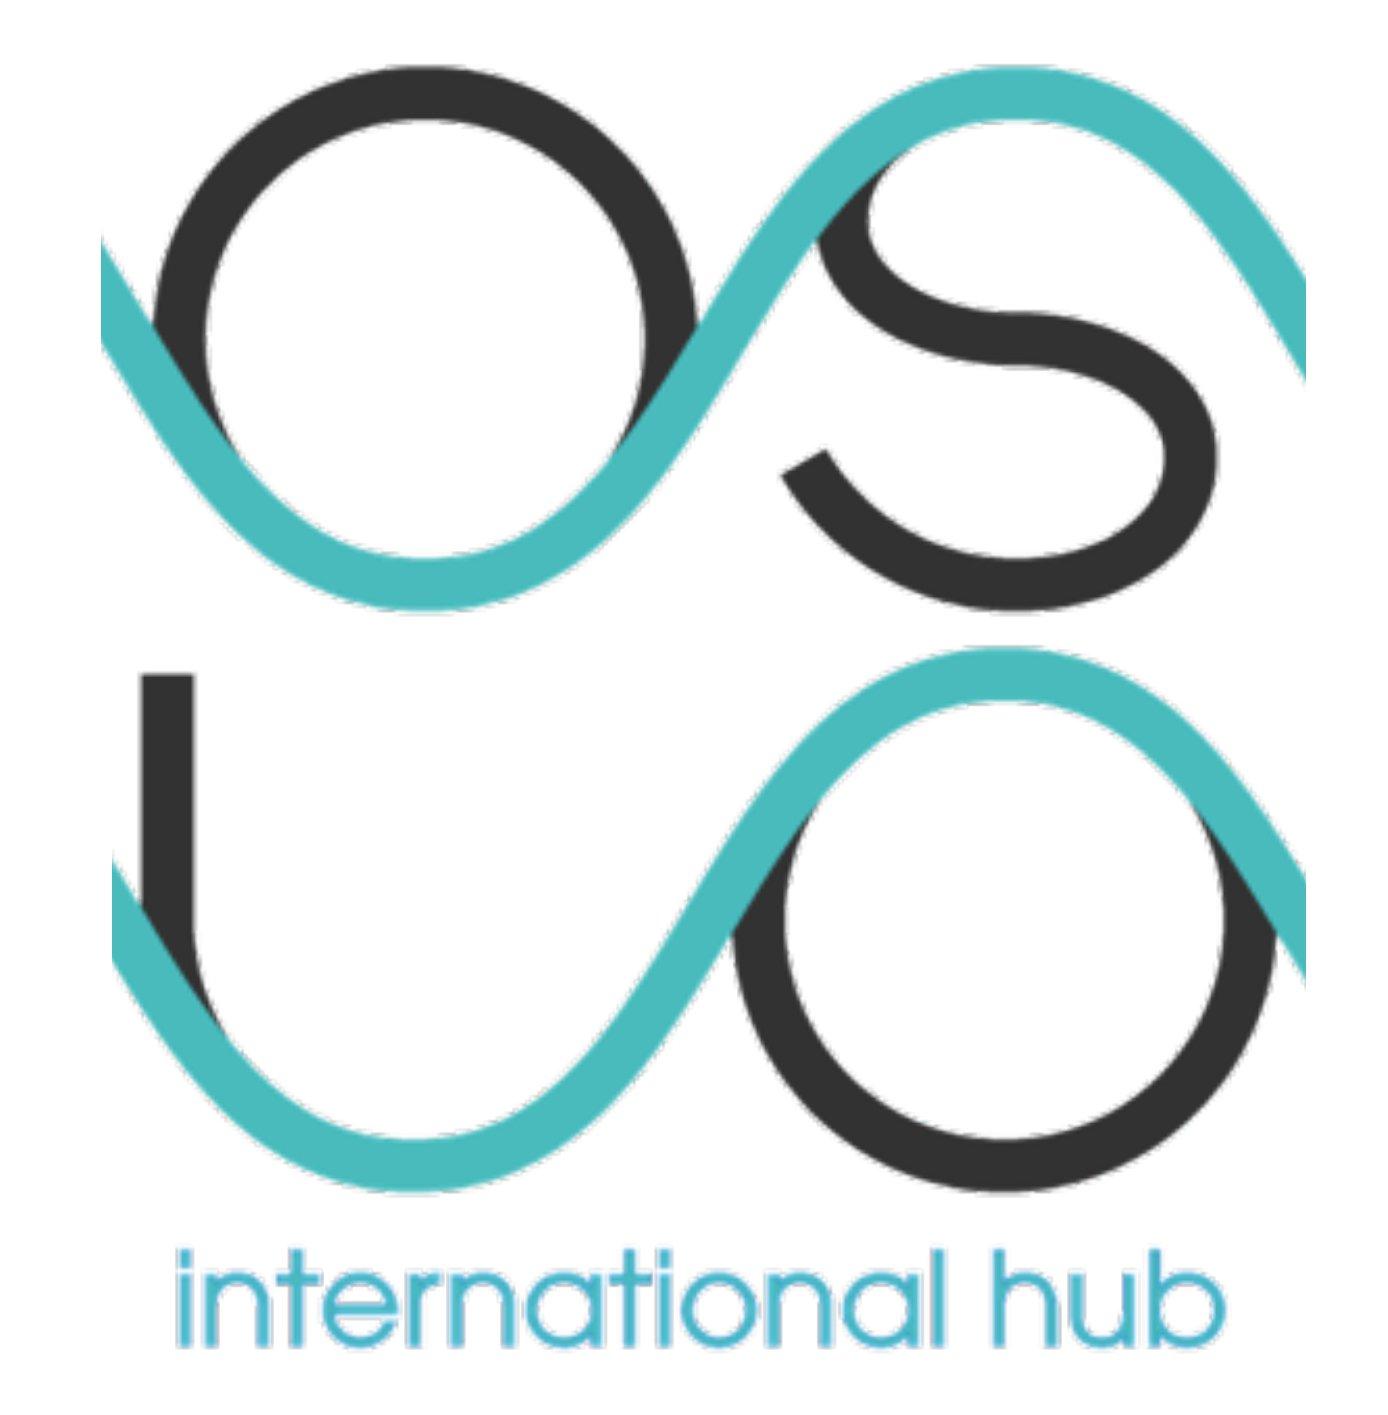 Oslo International Hub